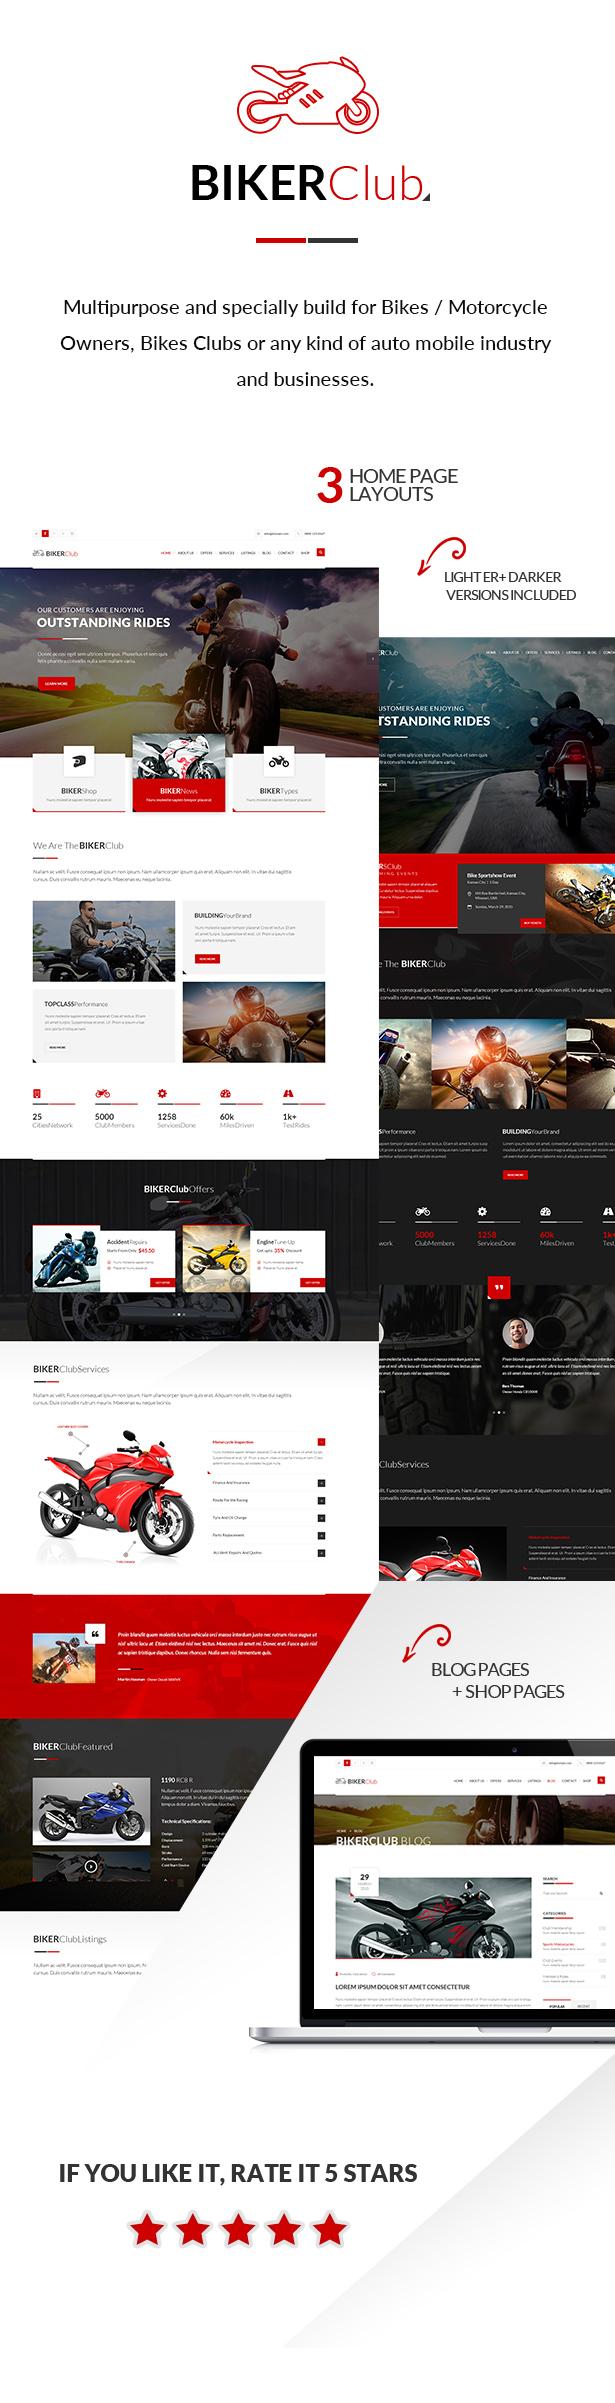 Biker Club - WordPress theme by venbradshaw | ThemeForest